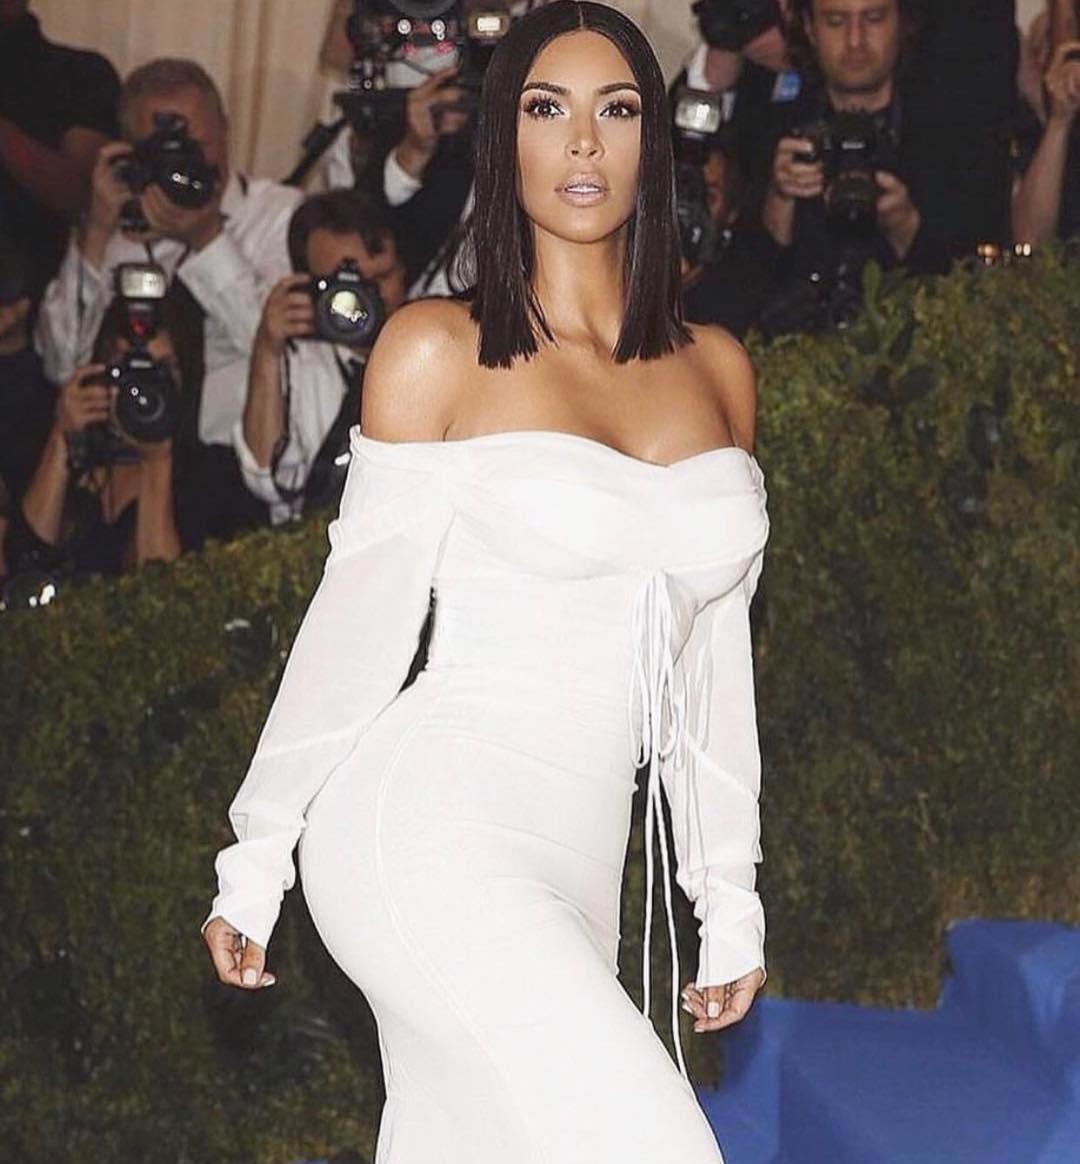 Kim Kardashian attends the 2017 Met Gala